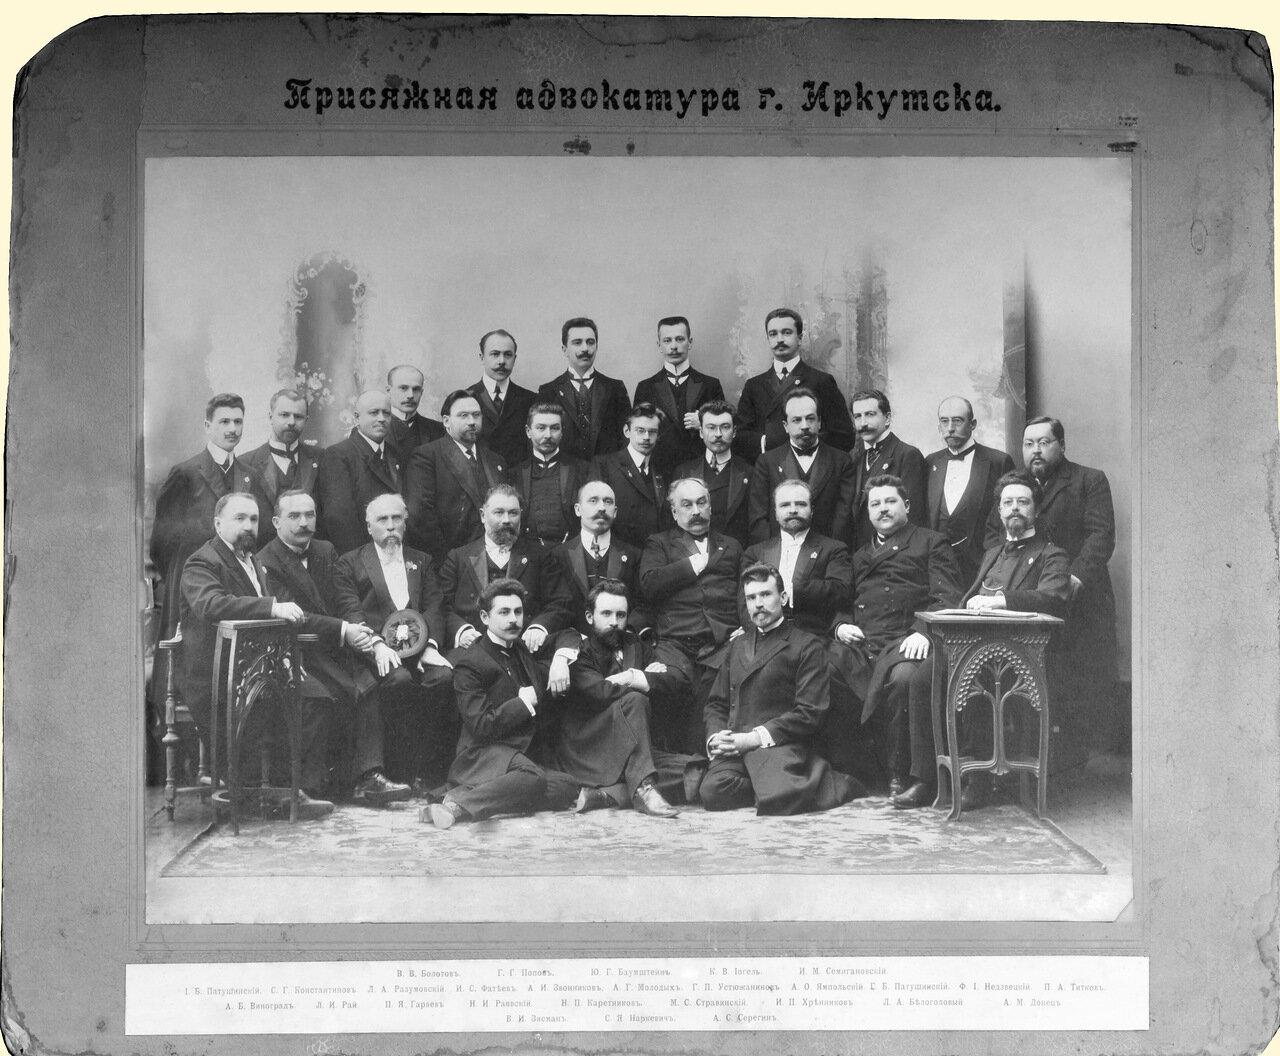 Присяжная адвокатура г. Иркутска.